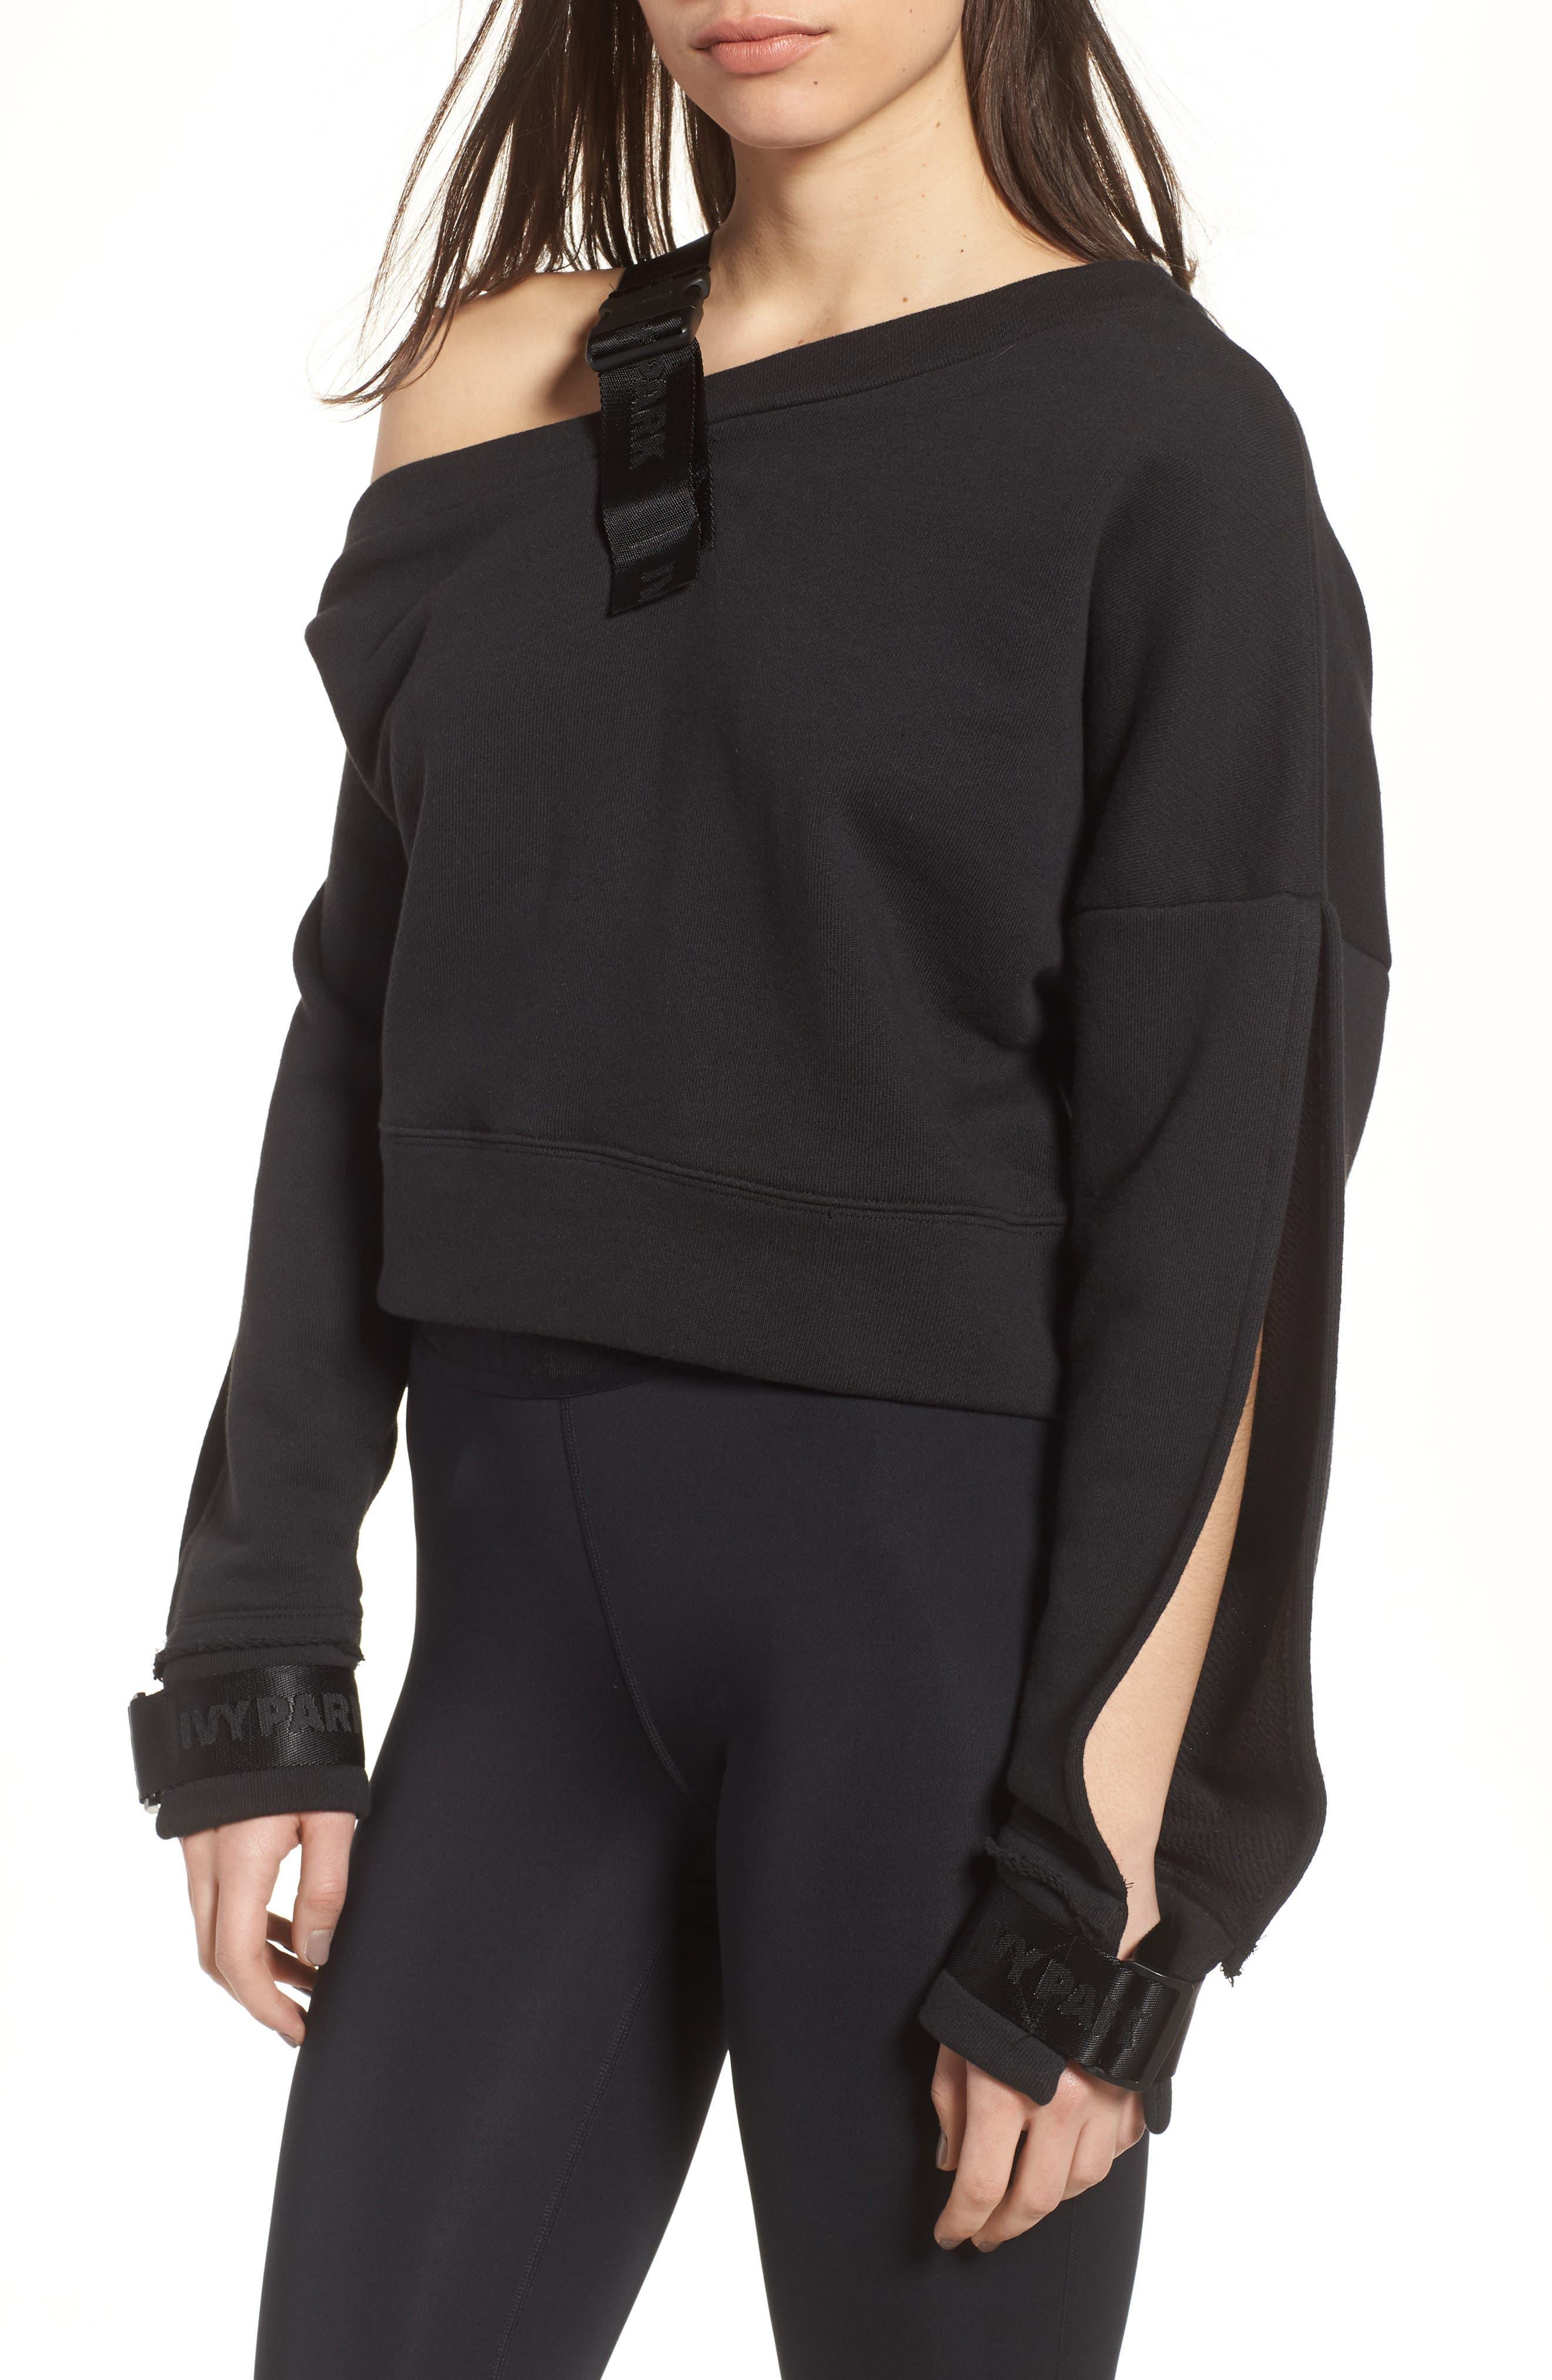 IVY PARK® Harness Strap Sweatshirt